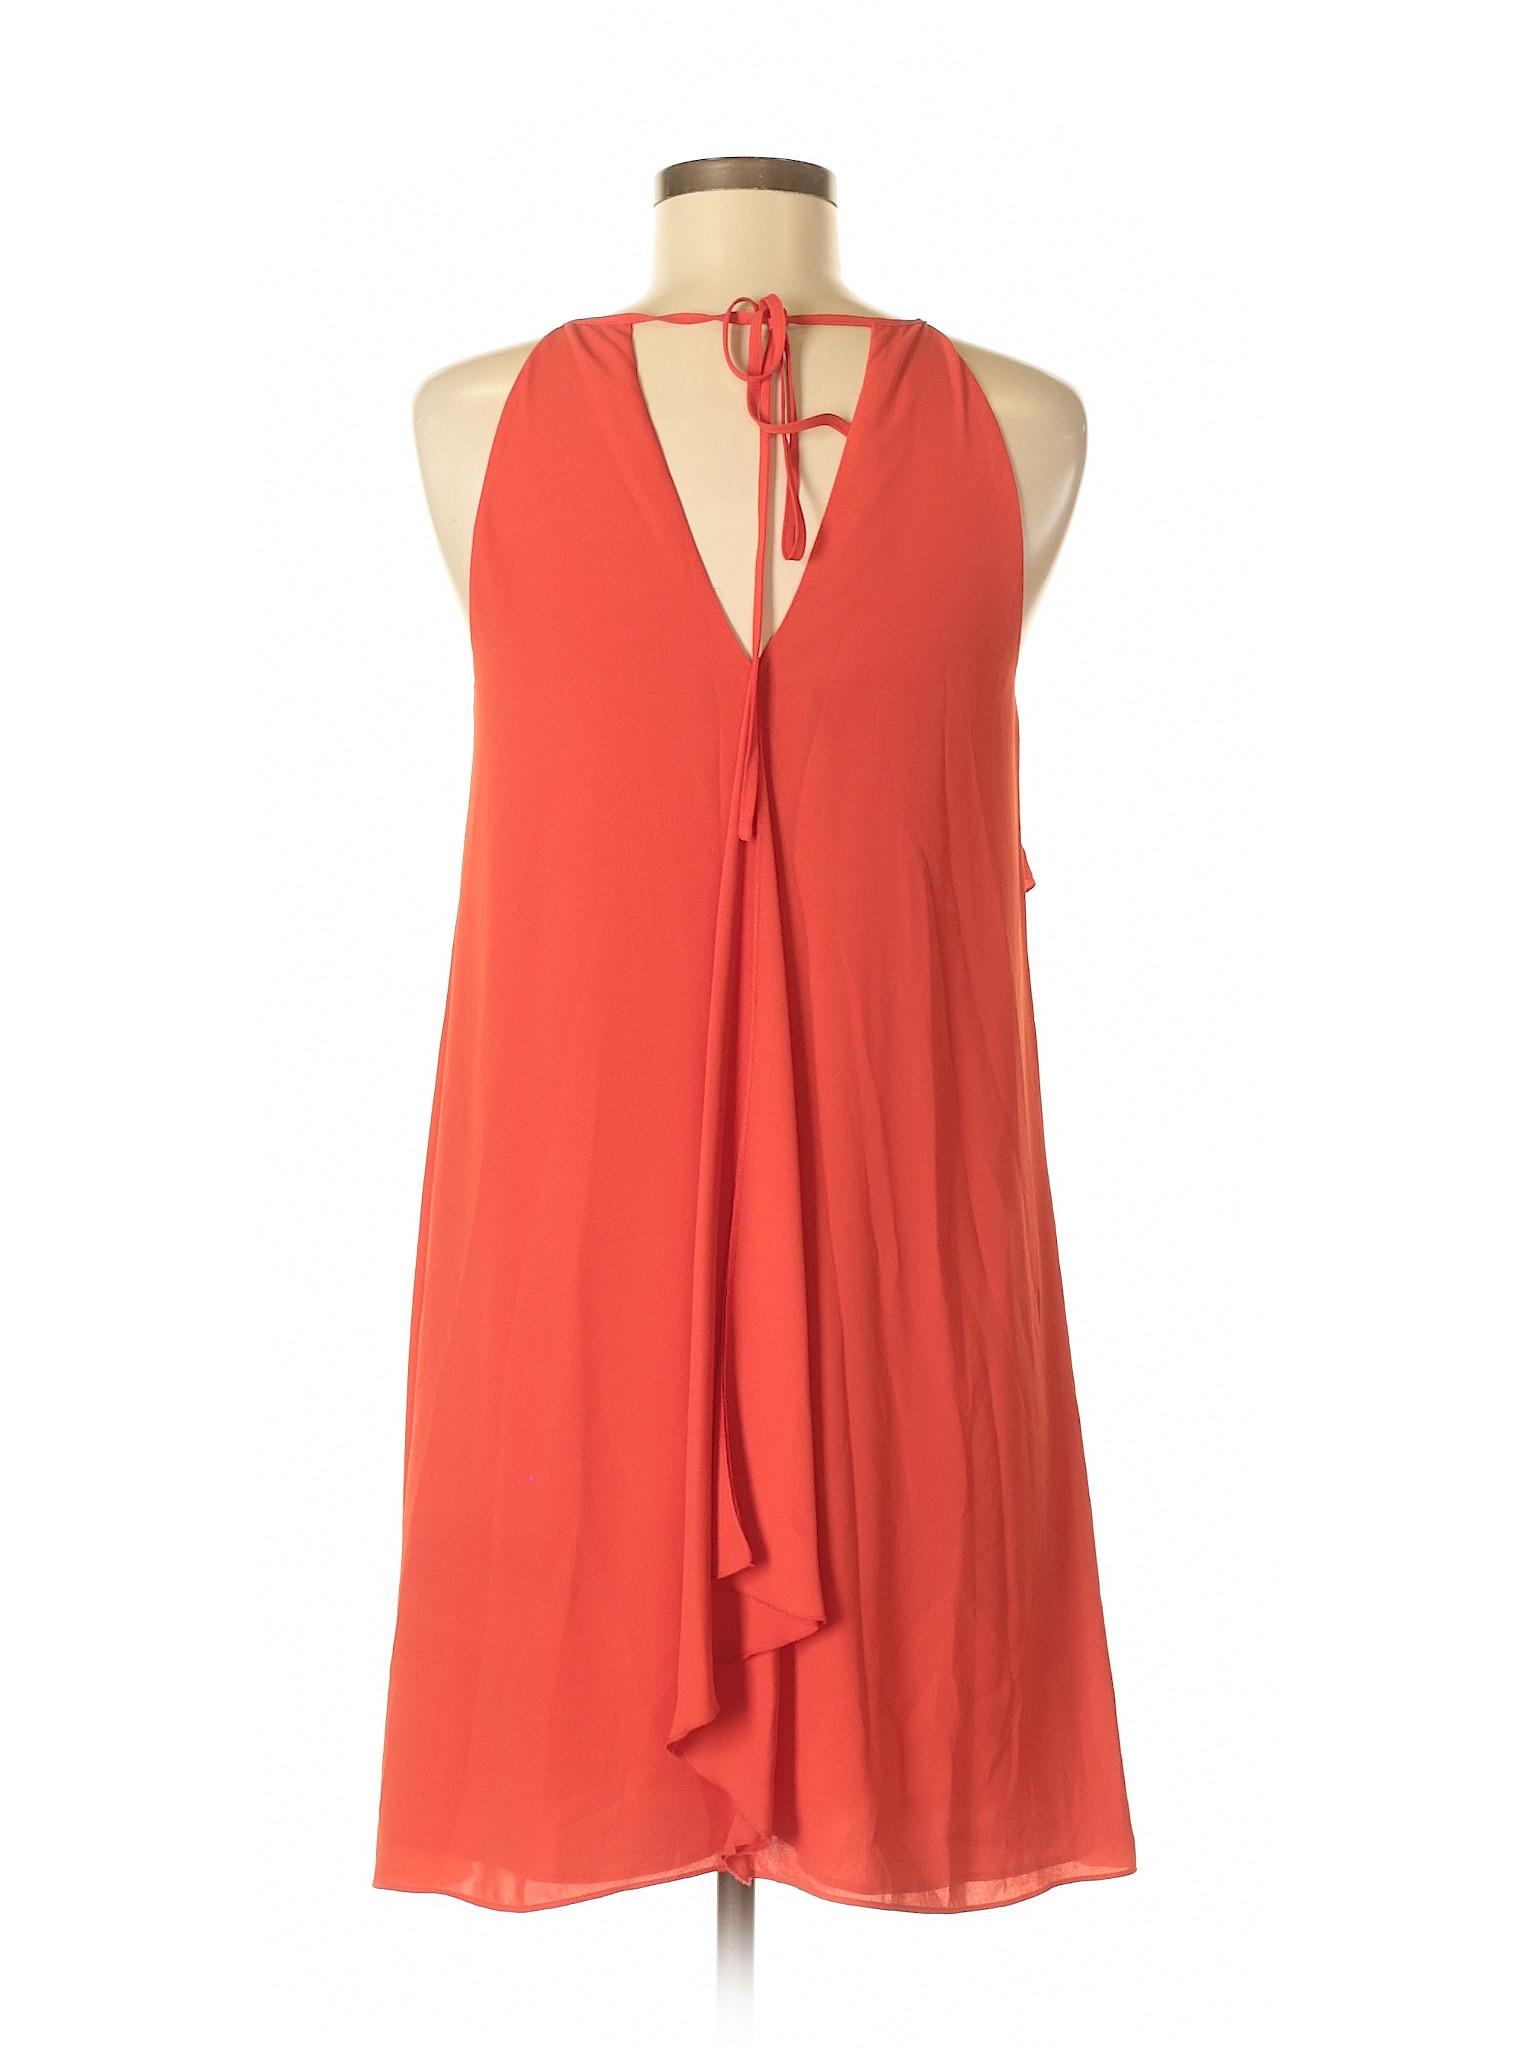 Boutique Casual BCBGMAXAZRIA Dress Boutique BCBGMAXAZRIA winter winter Casual Boutique Dress wgXqO77